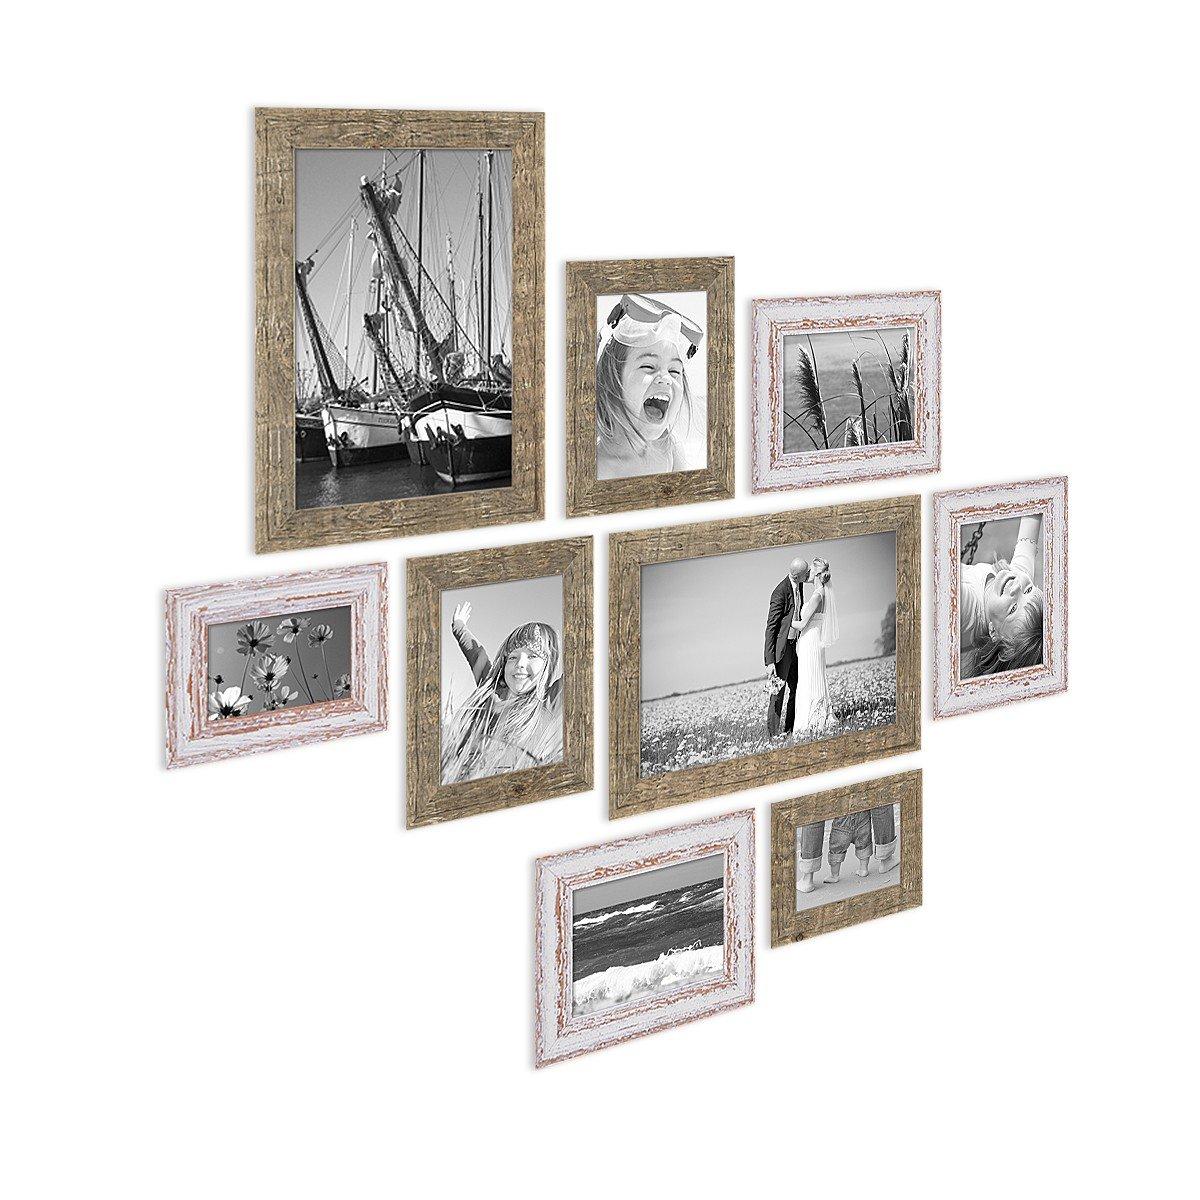 Amazon.de: PHOTOLINI 9er Set Bilderrahmen für Grosse Bilderwand ...